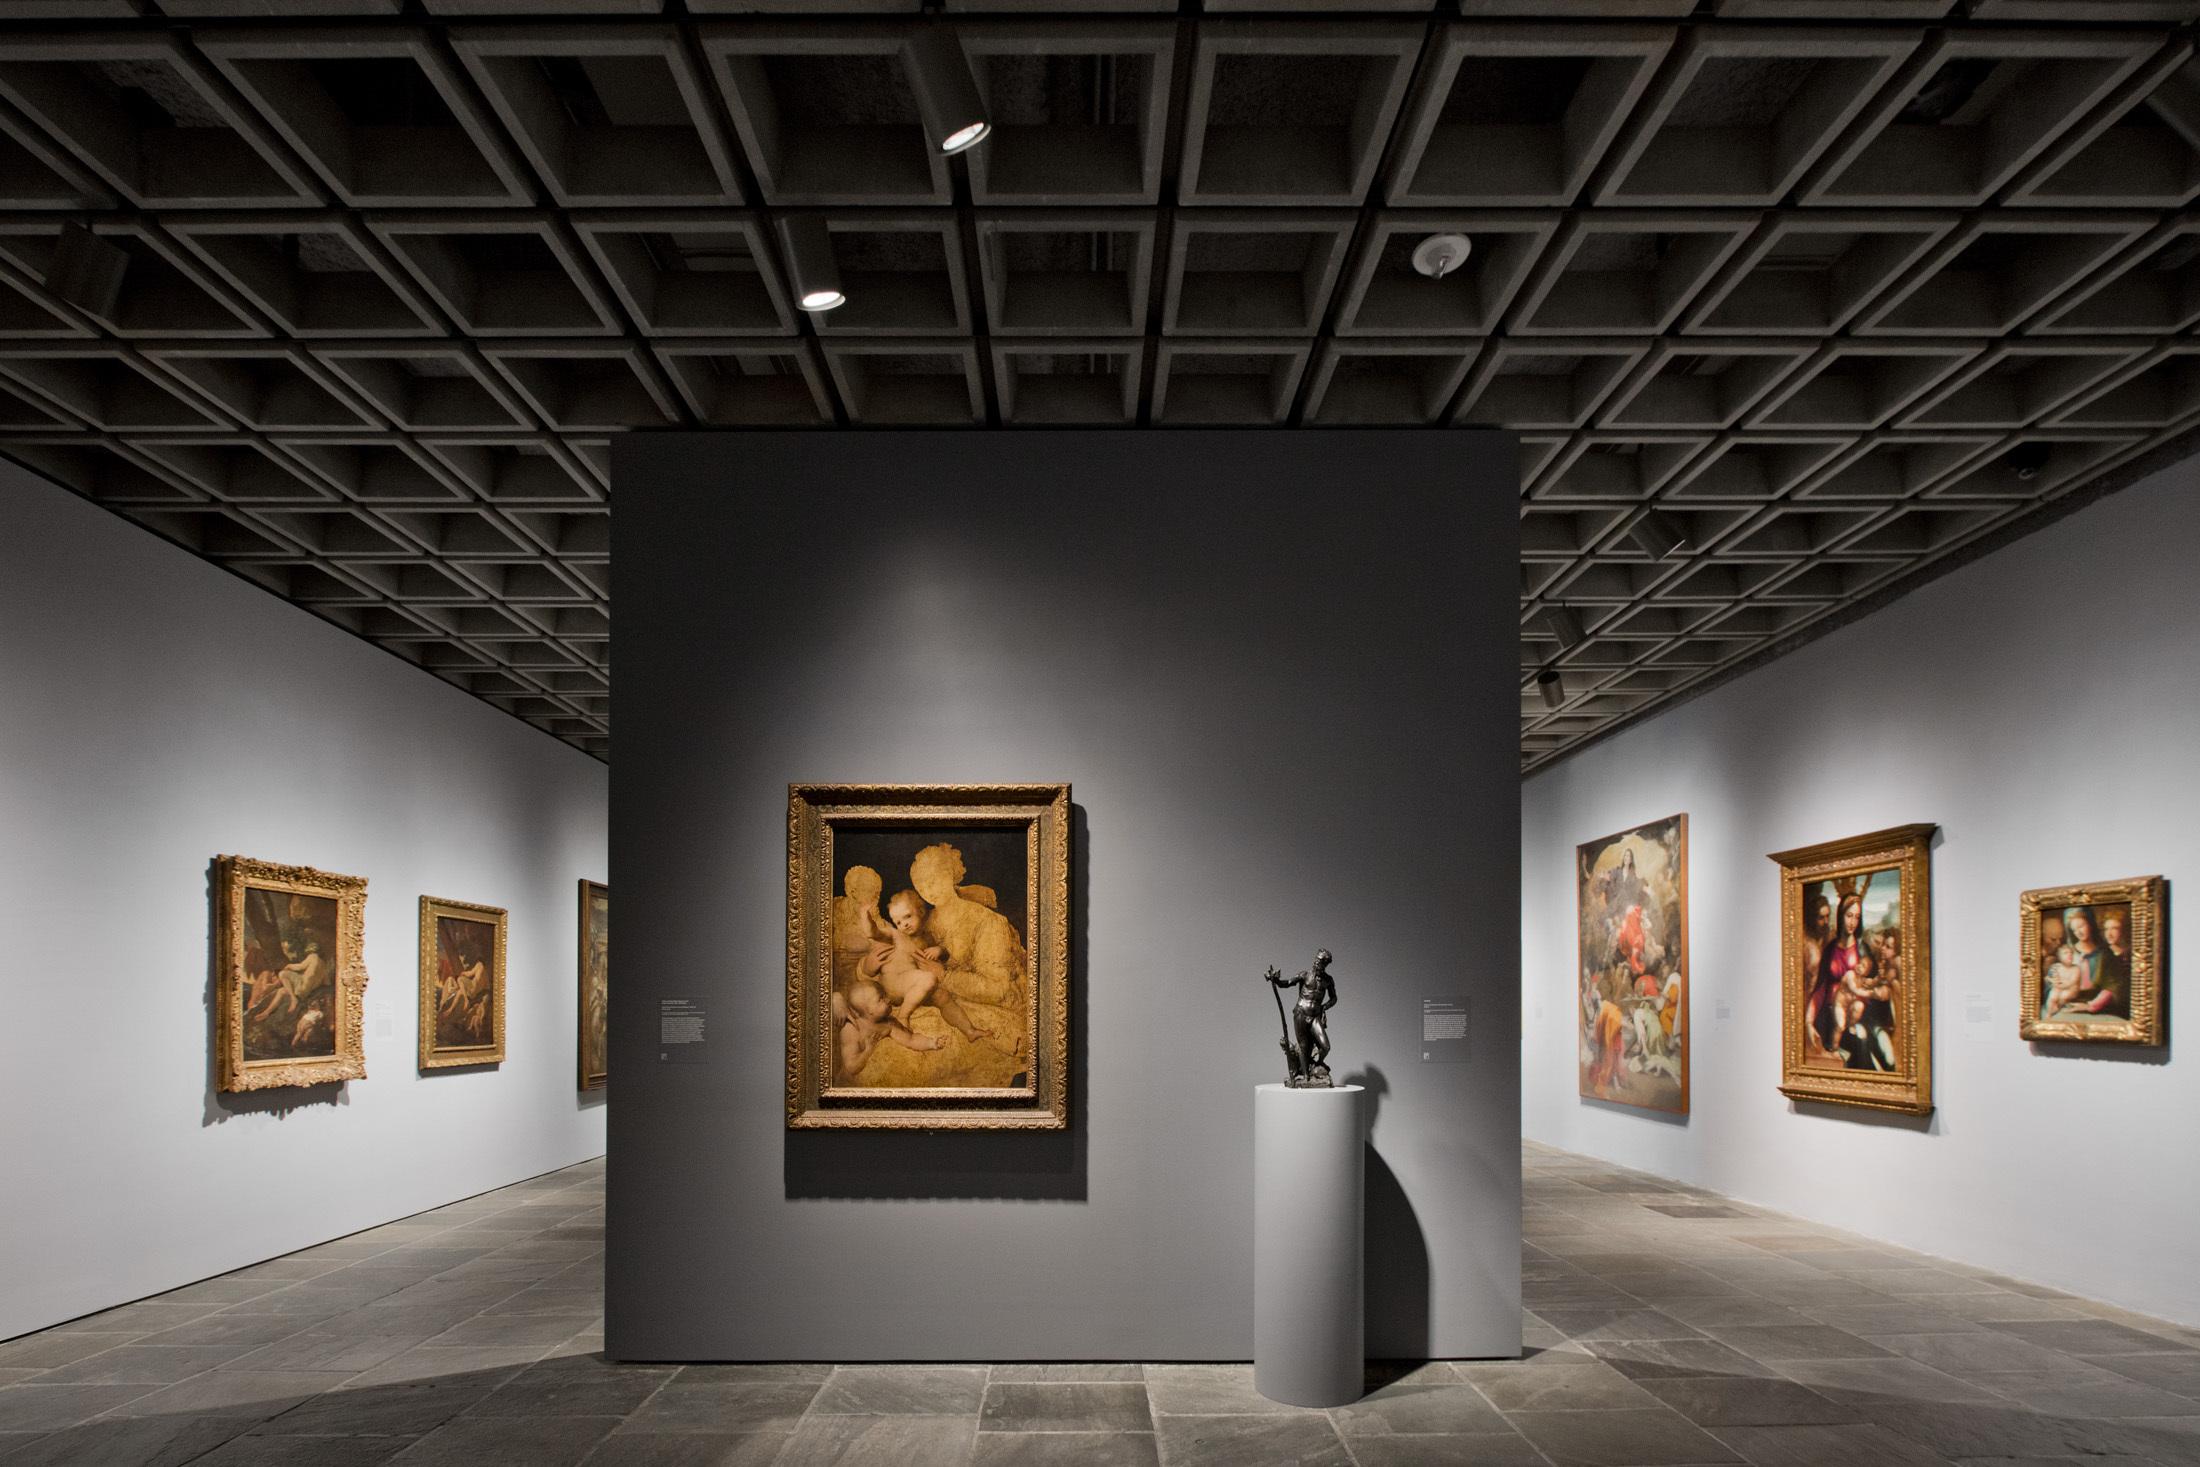 Installation de l'exposition 'Unfinished Thoughts' au Met Breuer Image via Bloomberg.com